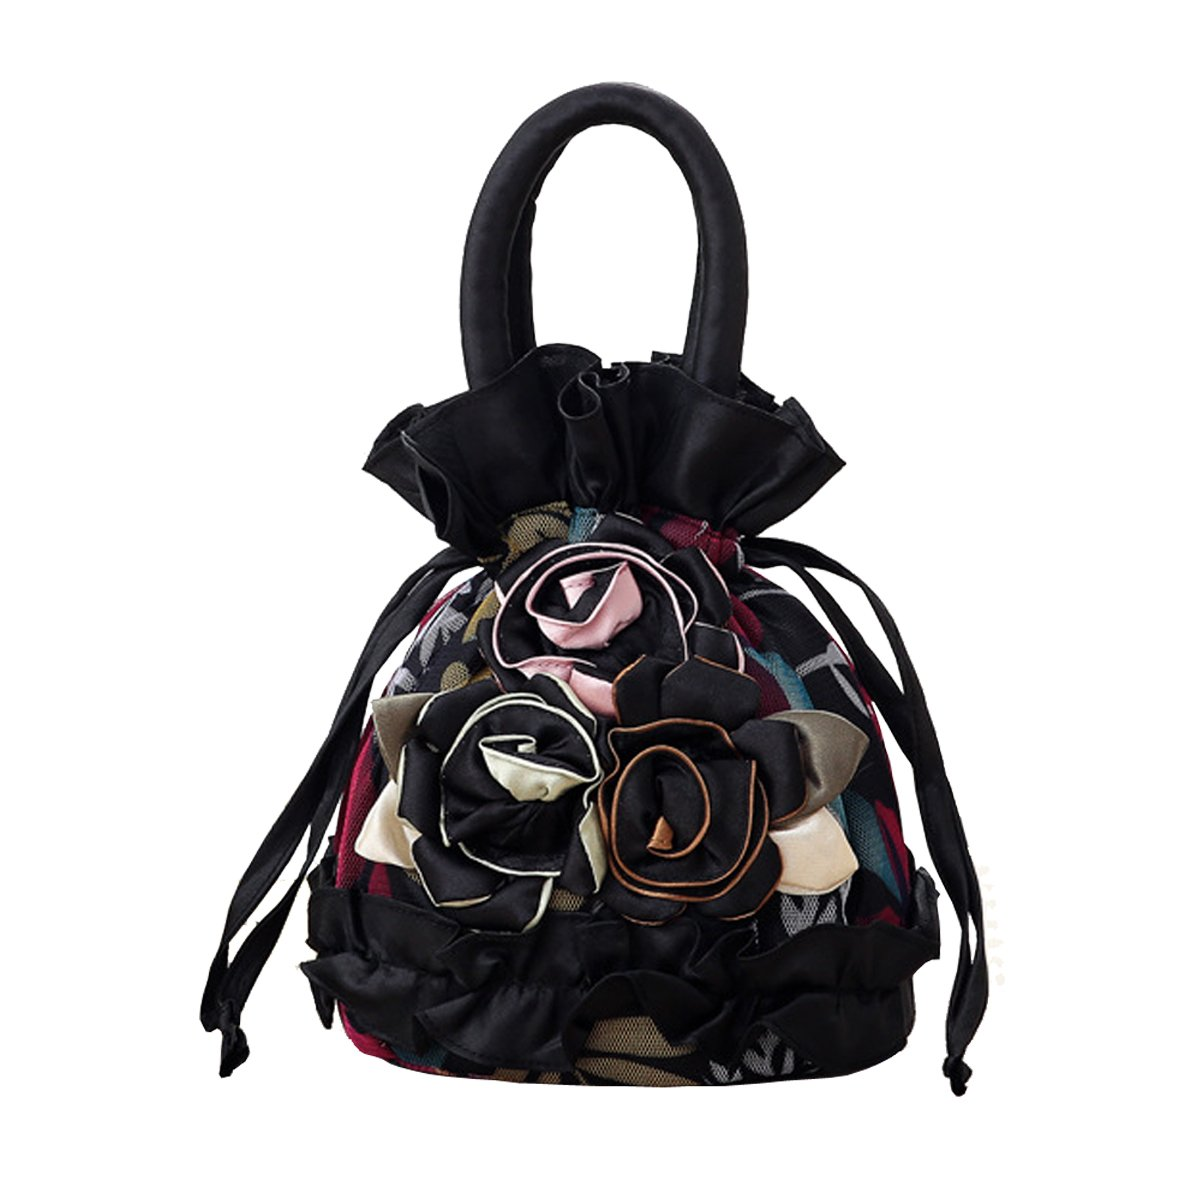 Womens Ladies Handbag Drawstring Bucket Bag Coin Purses Key Bags Cash Money Phone Pouches